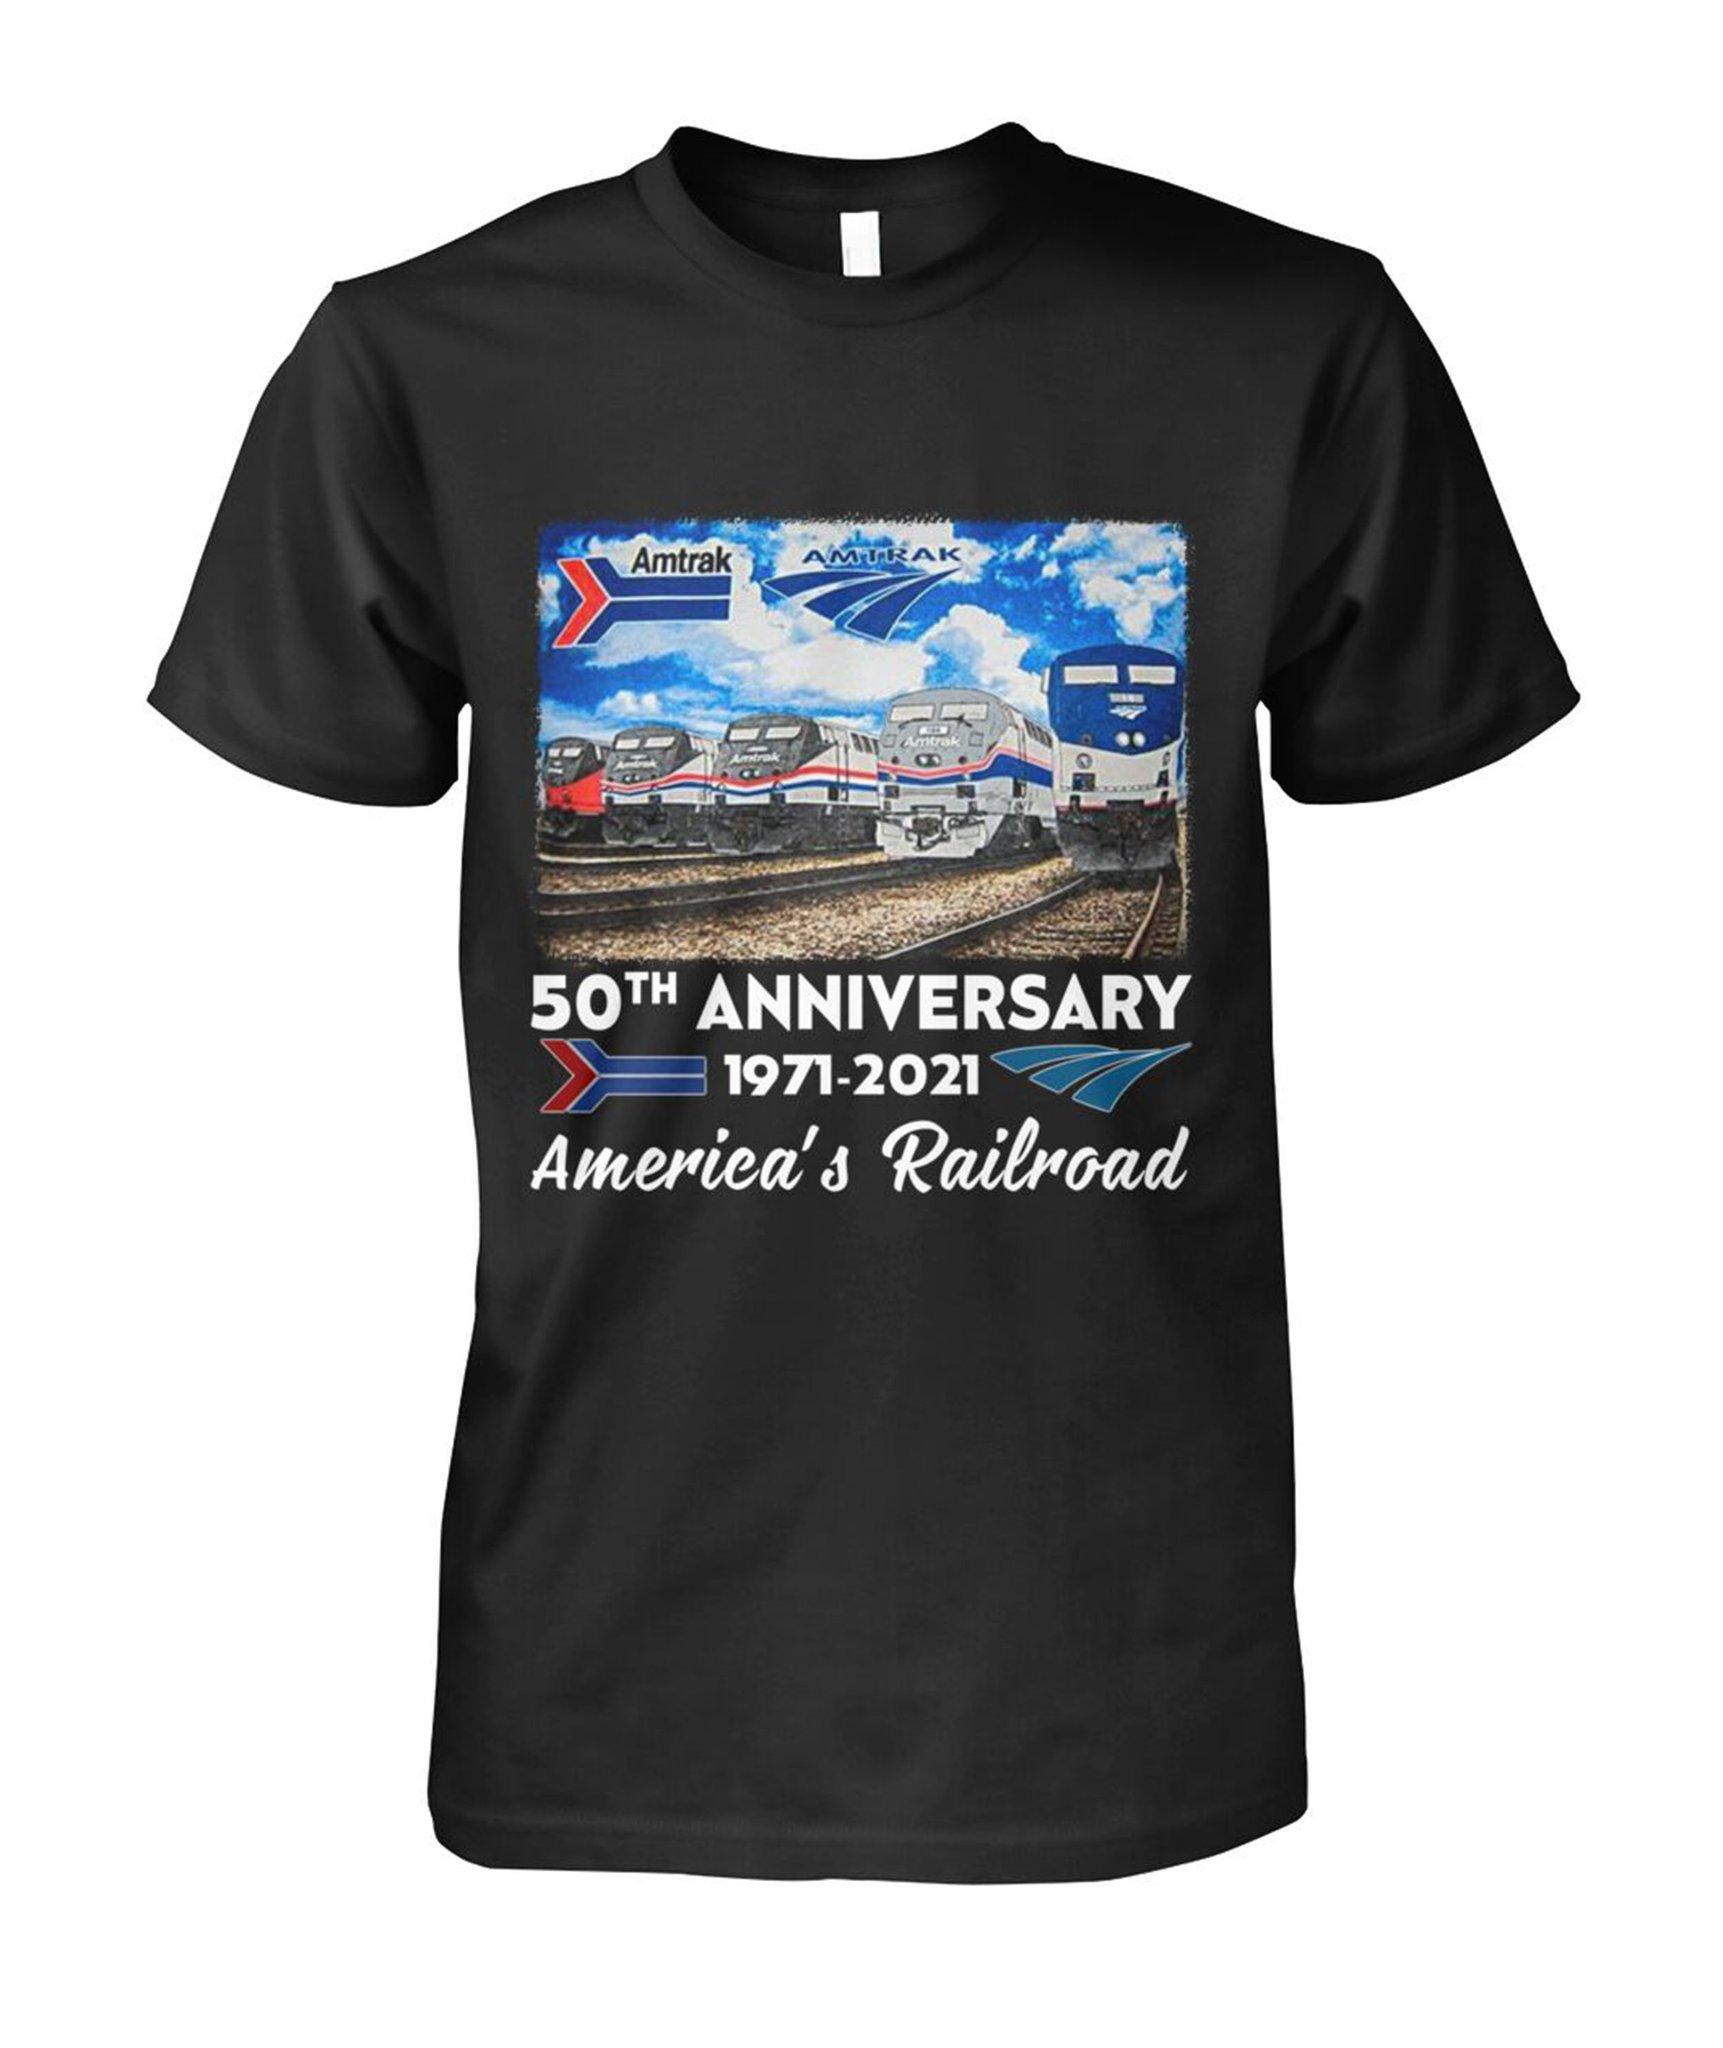 50th Anniversary 1971 2021 Americas Railroad Shirt1